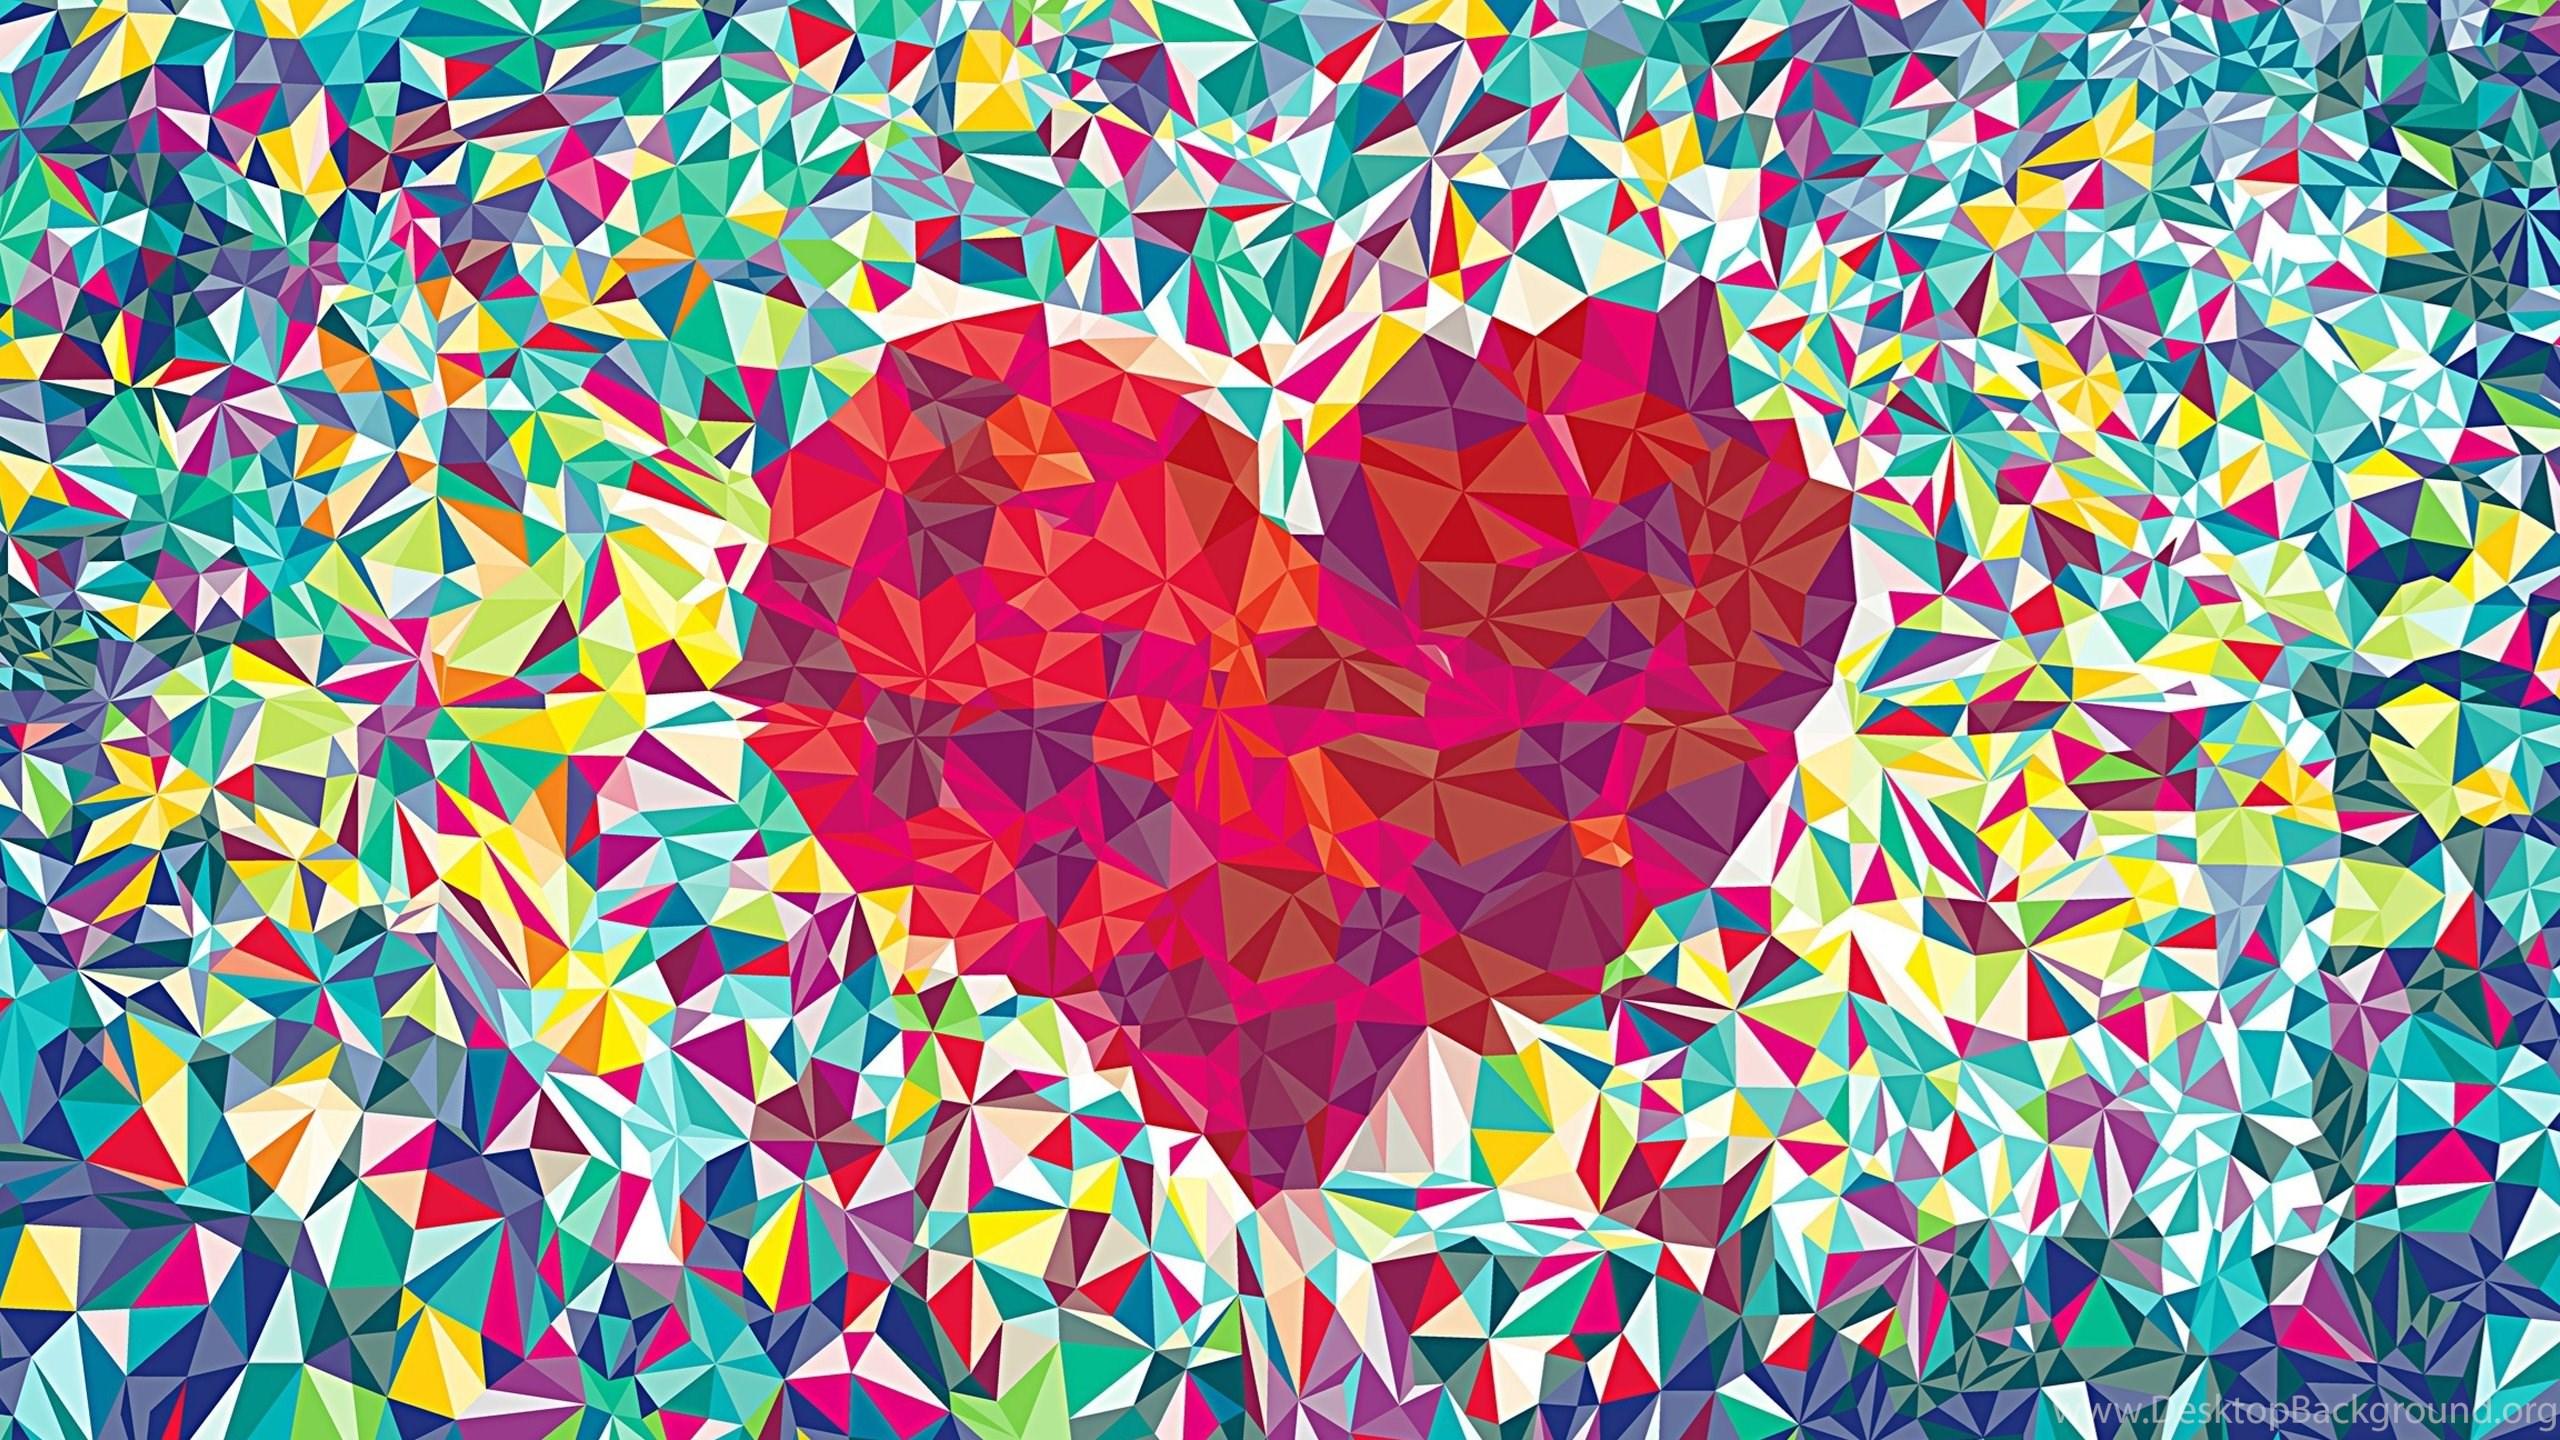 Abstract Love Art Elegant Wallpapers 261d Desktop Background